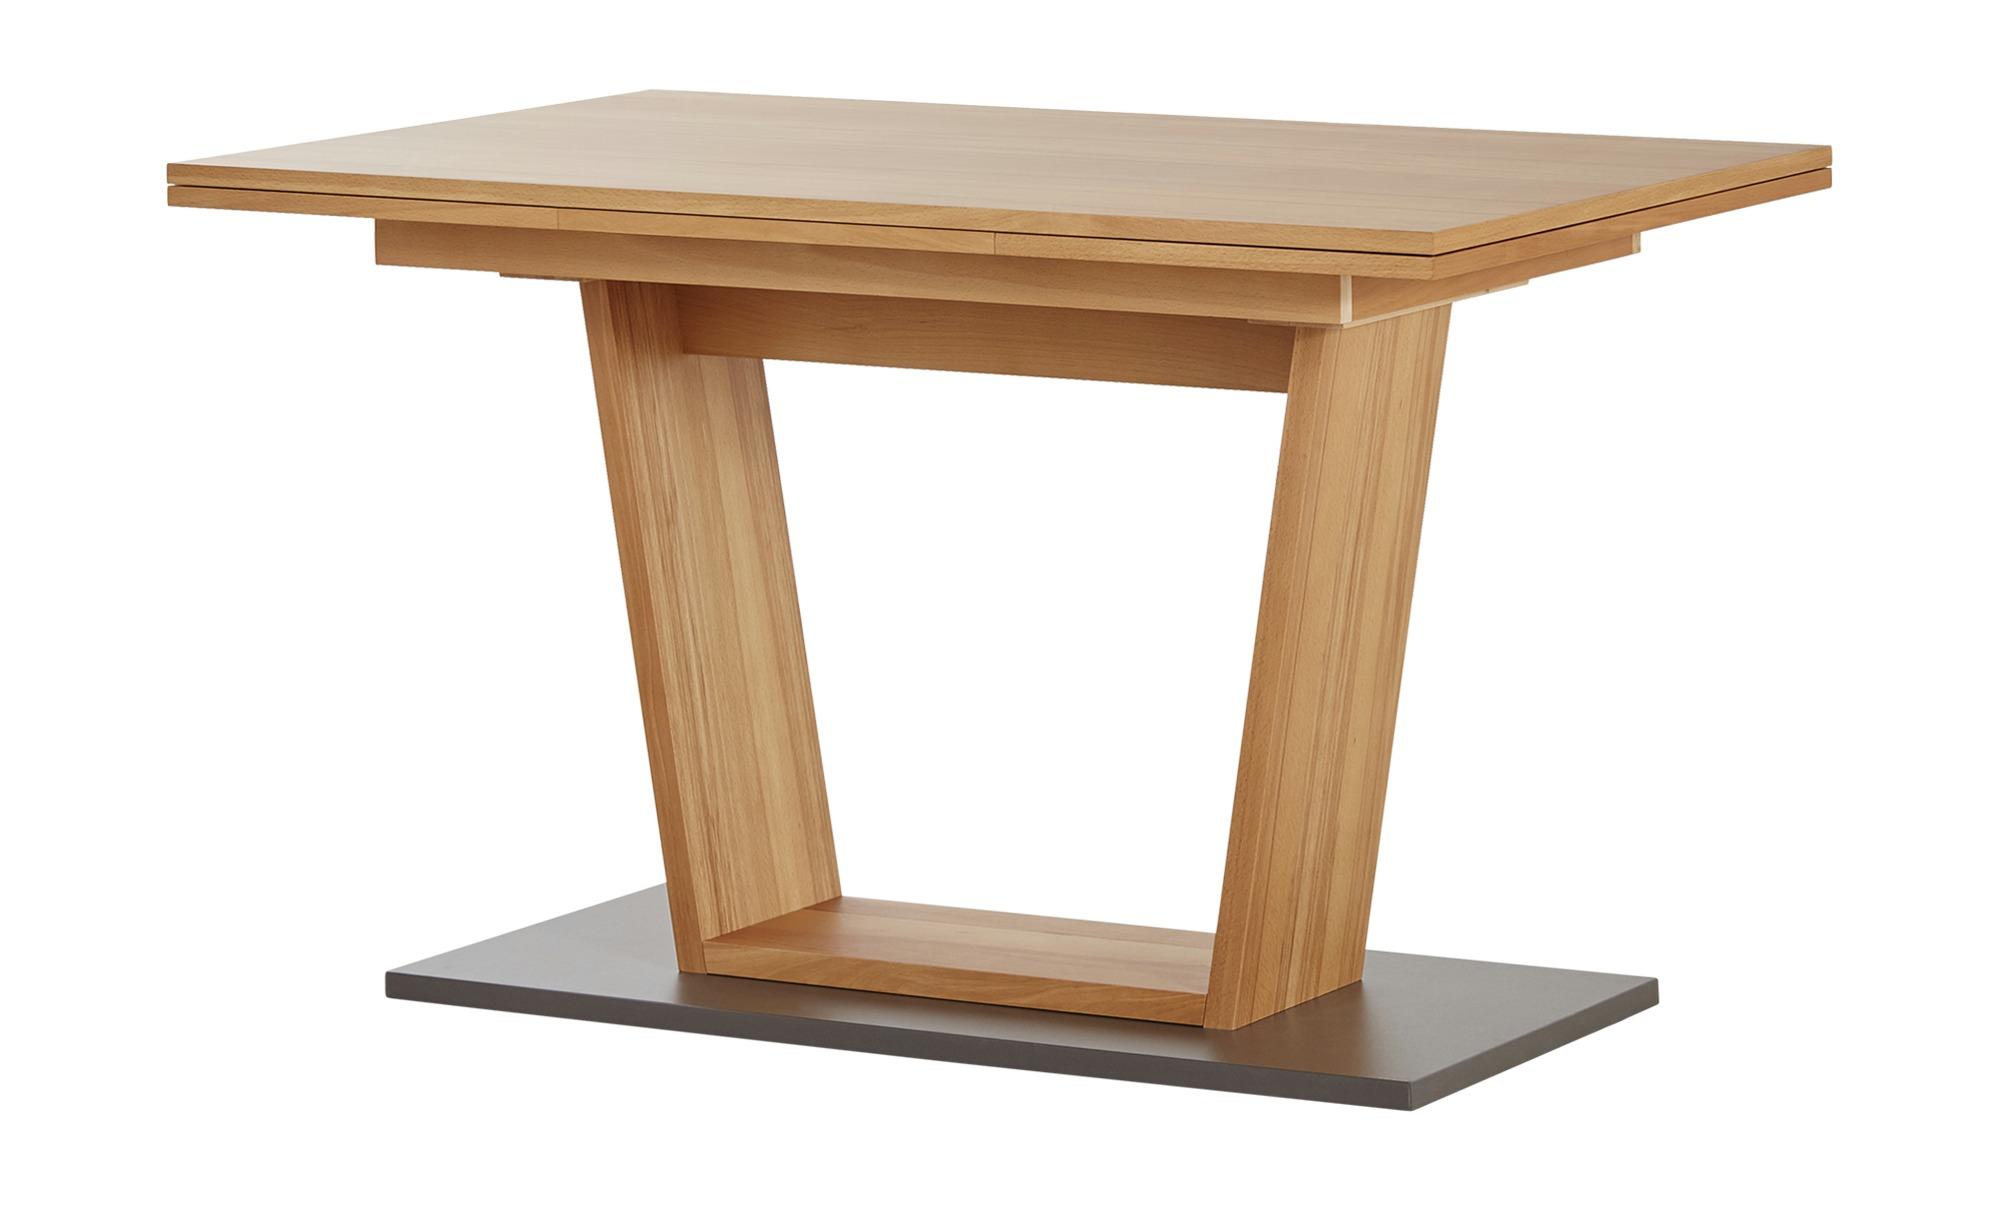 Woodford Esstisch  Alma ¦ holzfarben ¦ Maße (cm): B: 82 H: 76 Tische > Esstische > Esstische ausziehbar - Höffner